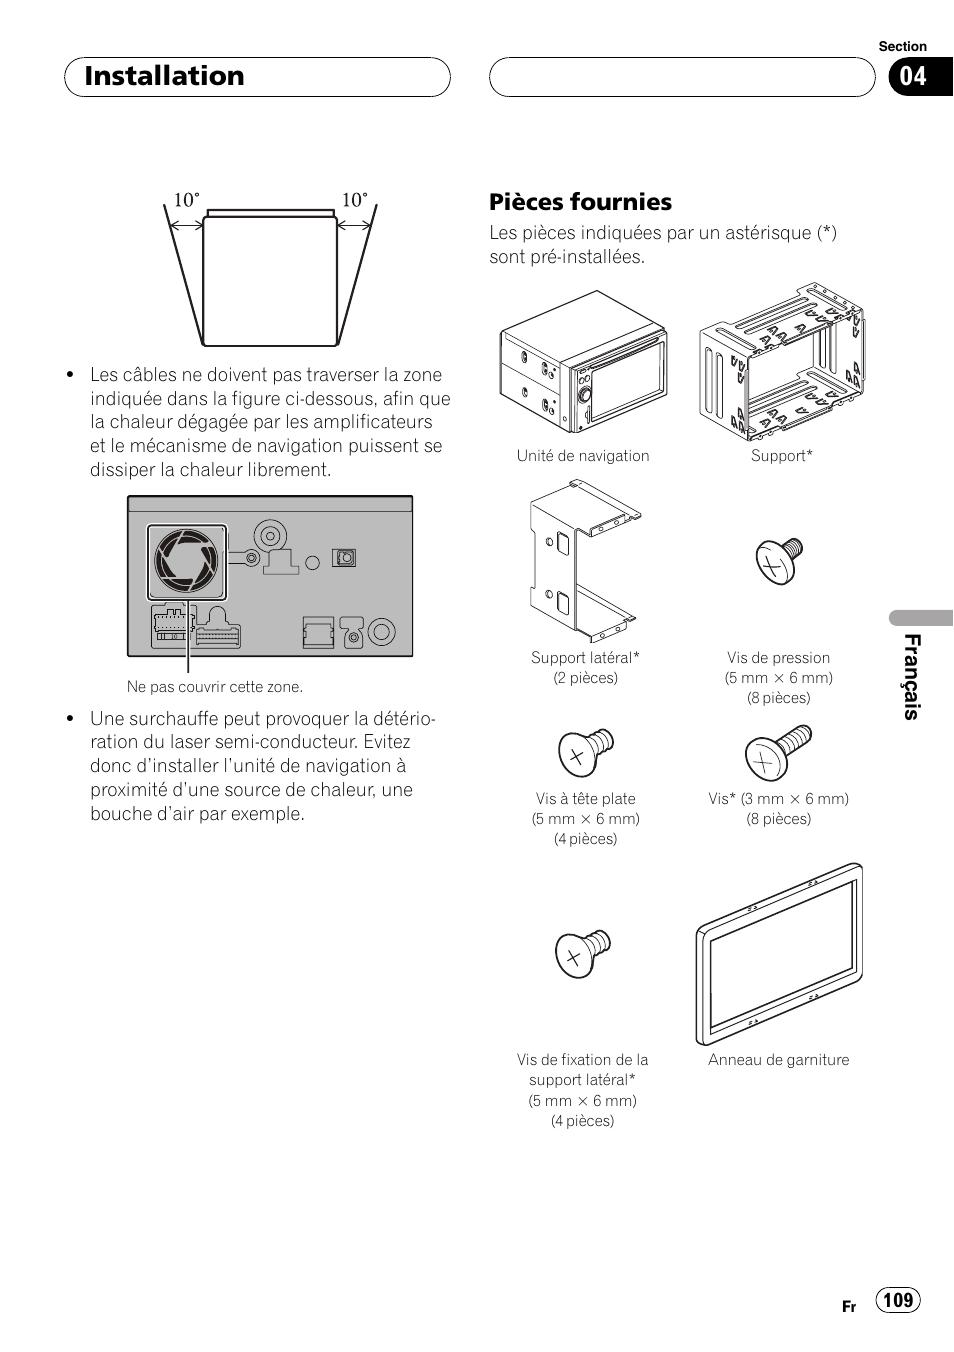 Pièces fournies 109, Installation, Pièces fournies | Français | Pioneer  AVIC F900BT User Manual